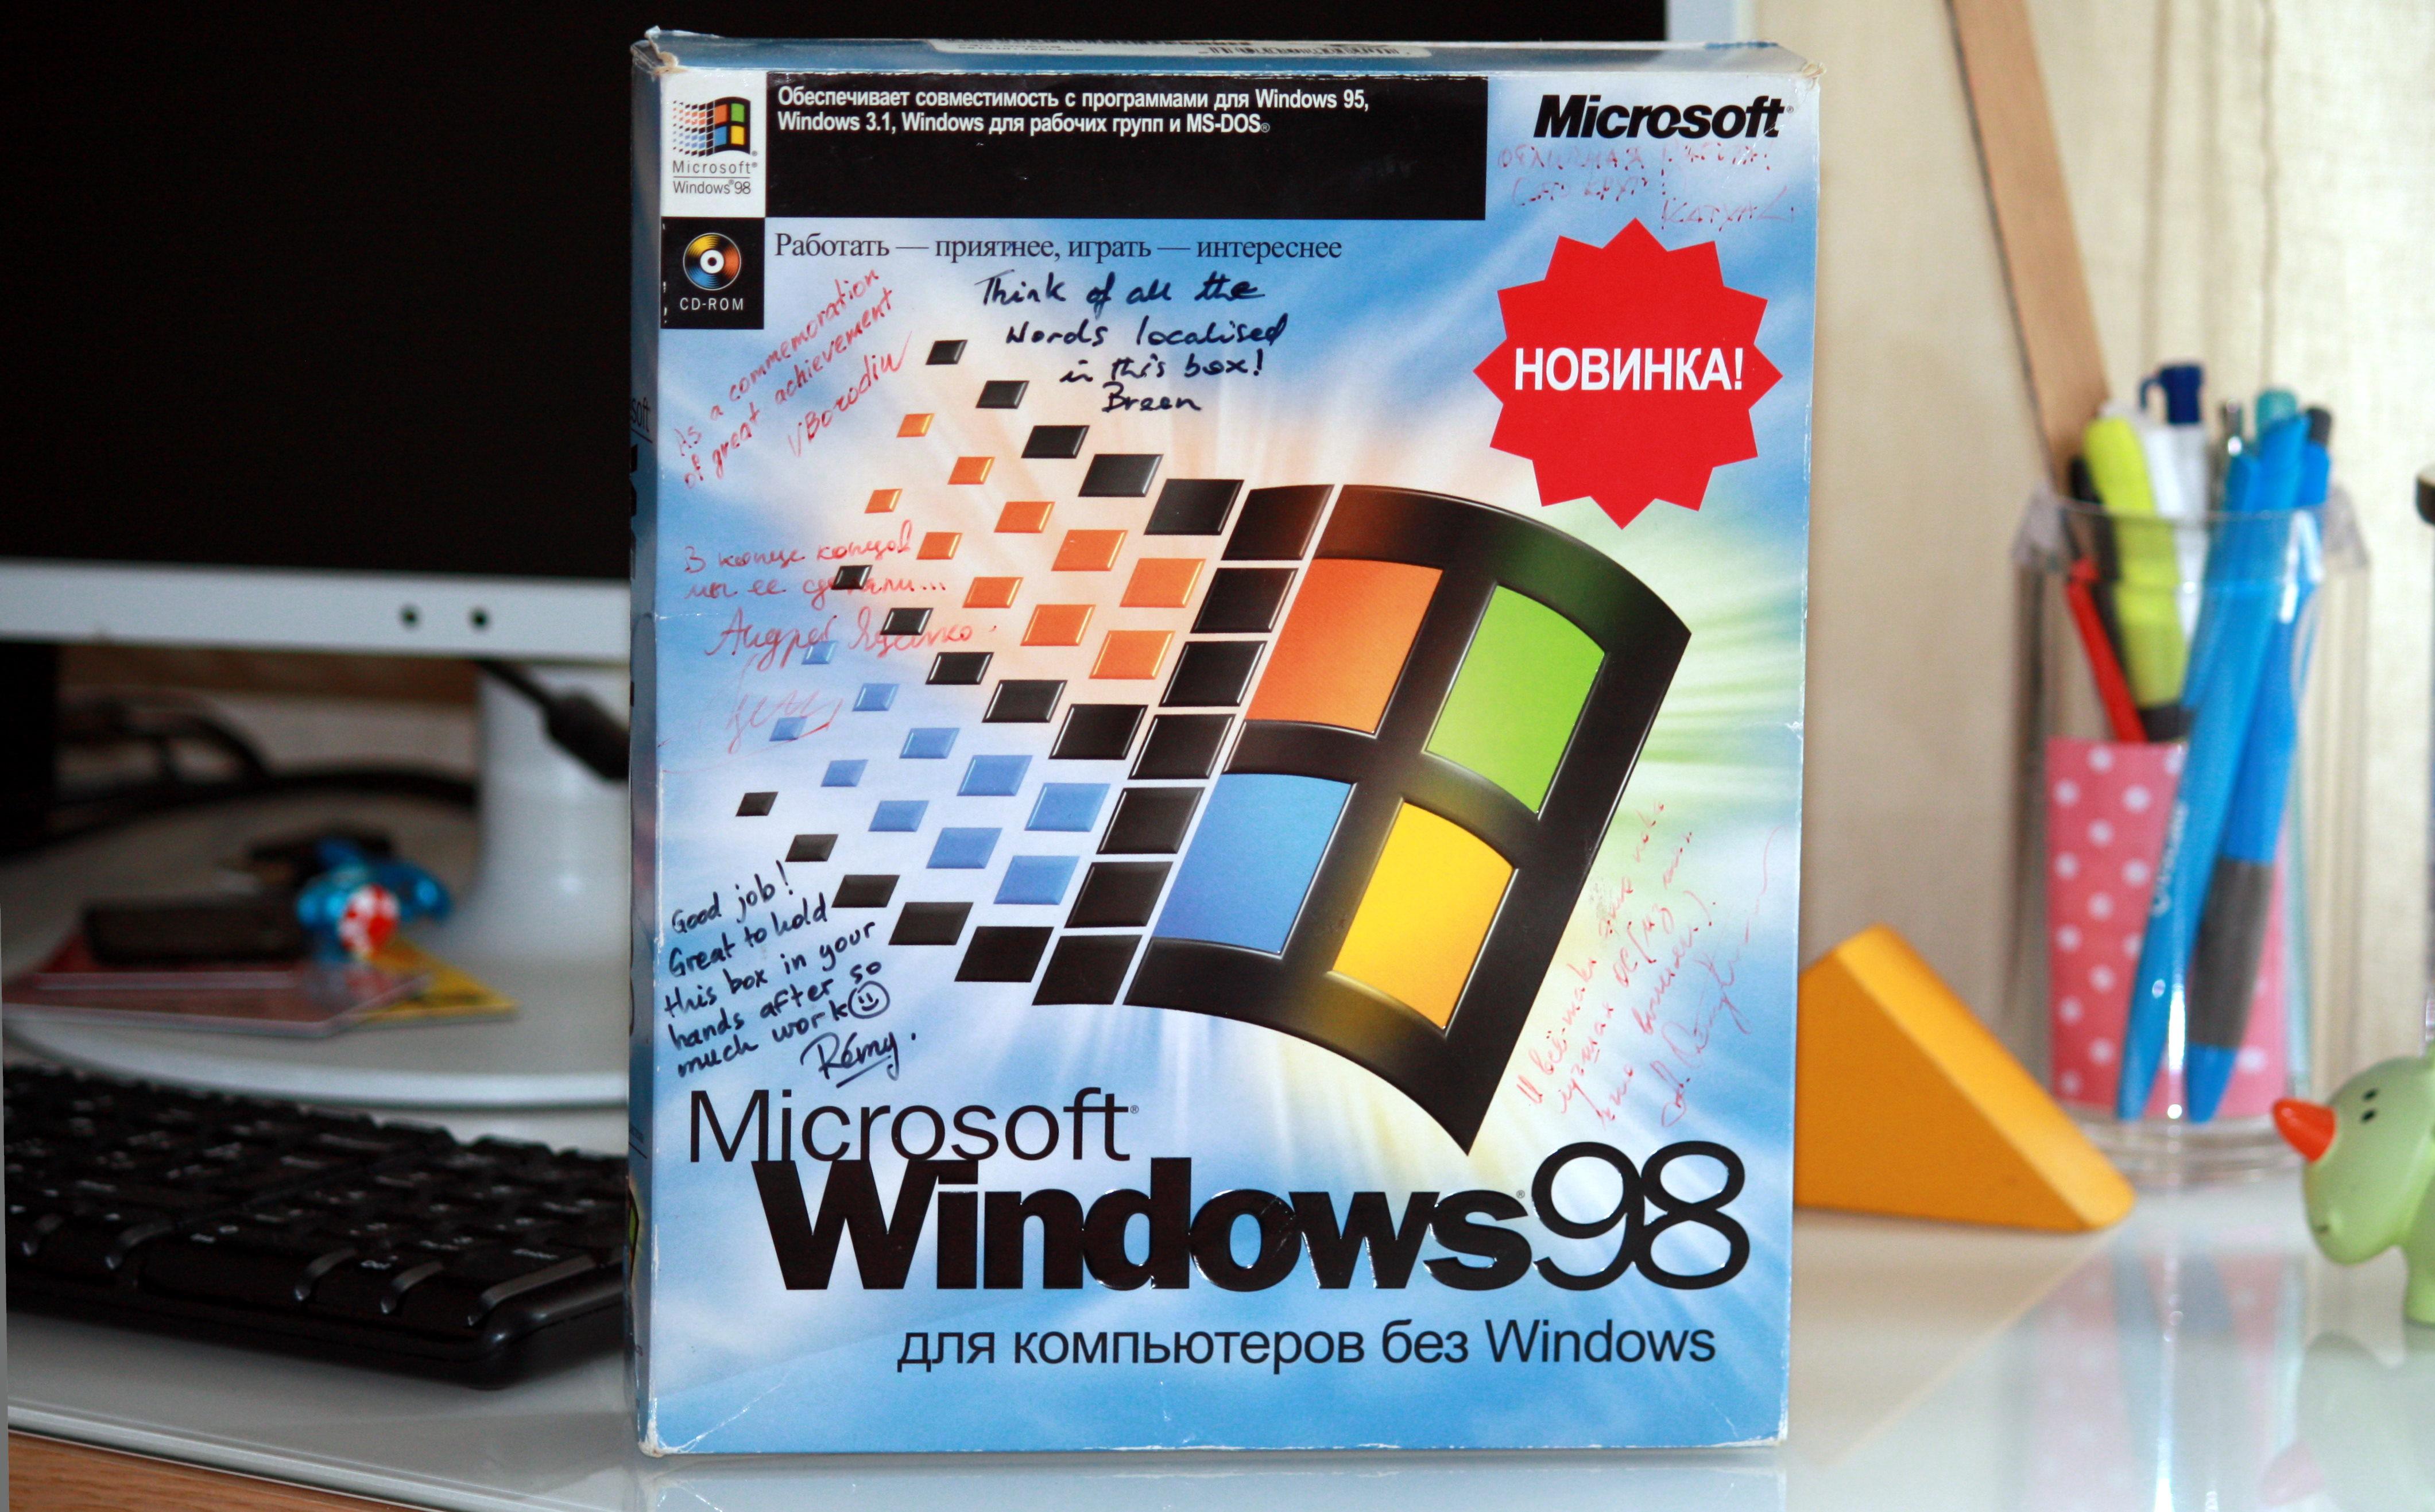 Windows 98 RU signed by Microsoft WPGI colleagues